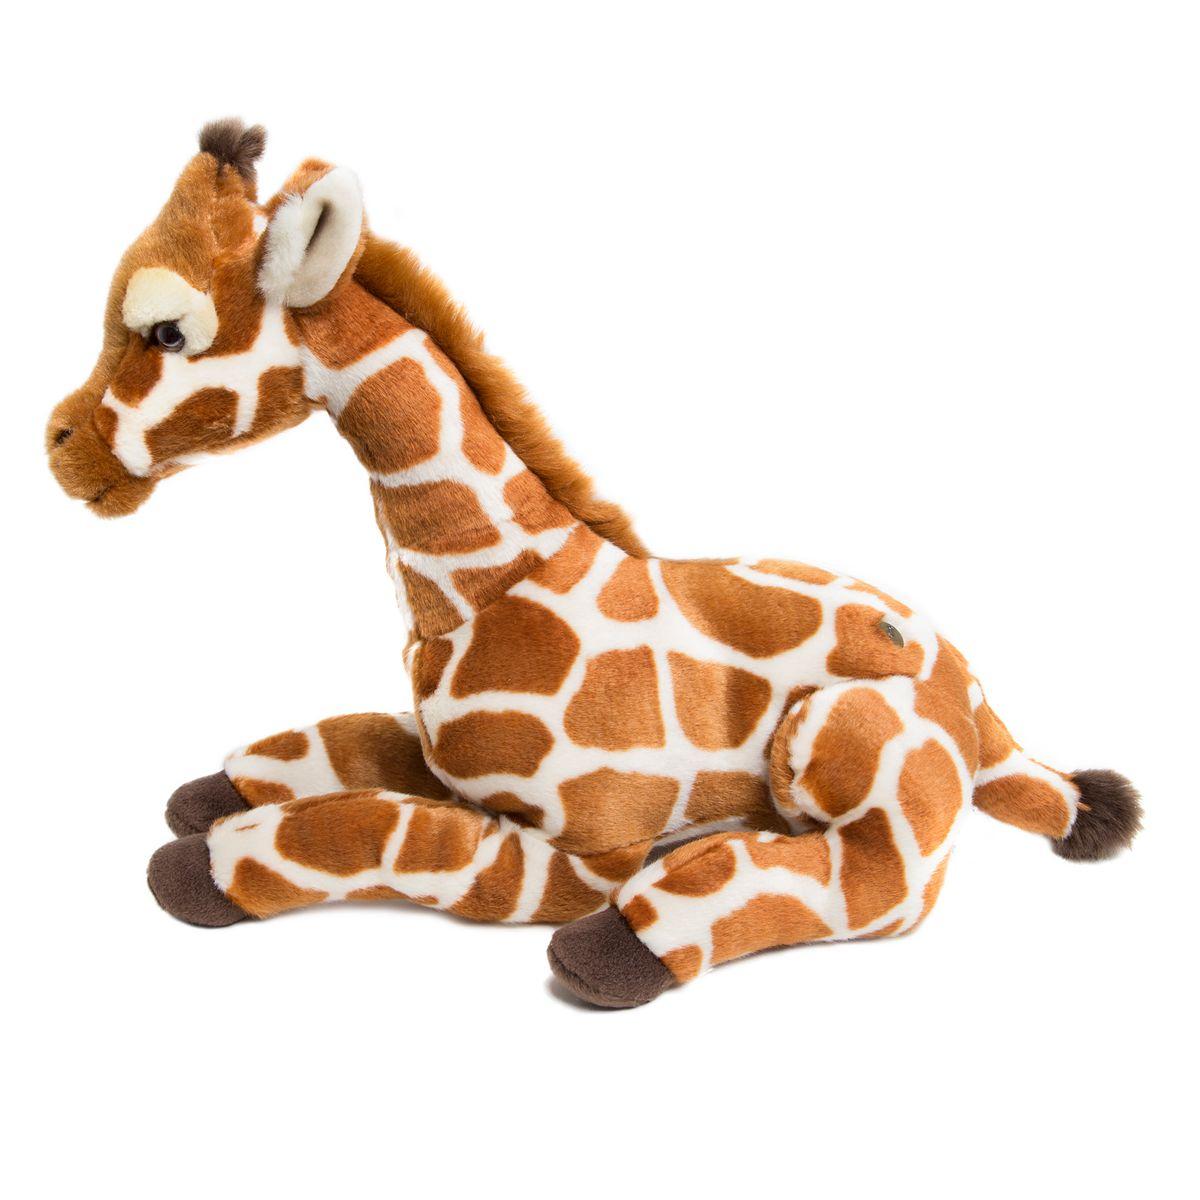 FAO Schwarz 12-inch Calf Giraffe Toy Plush- .49!